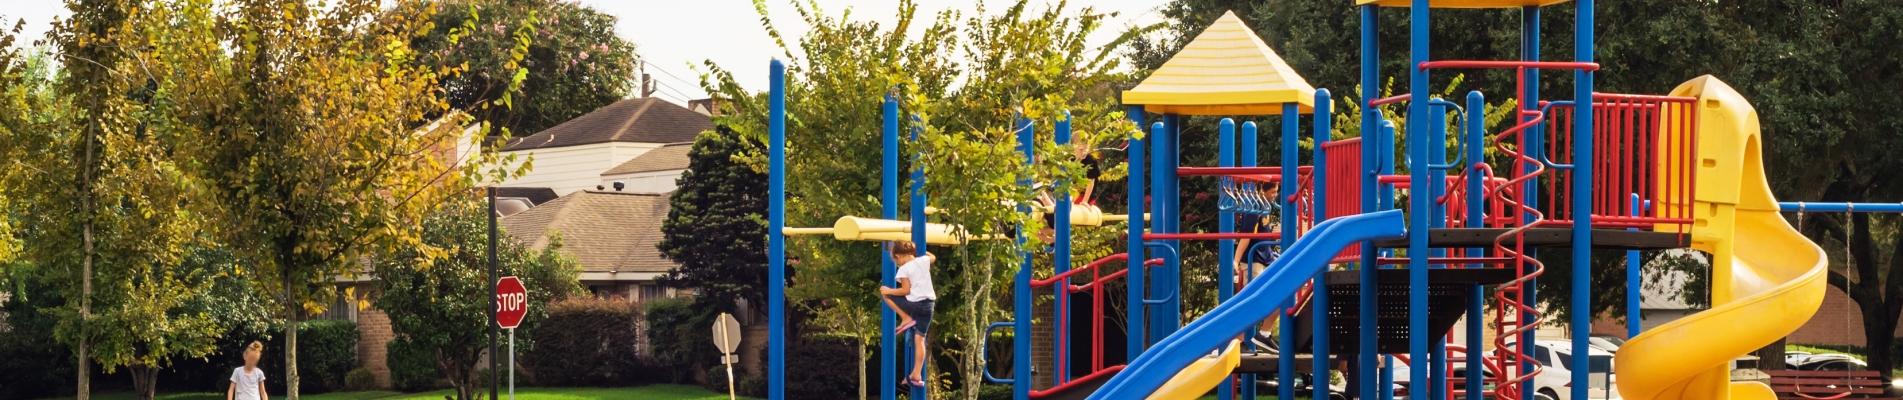 Intego Playground